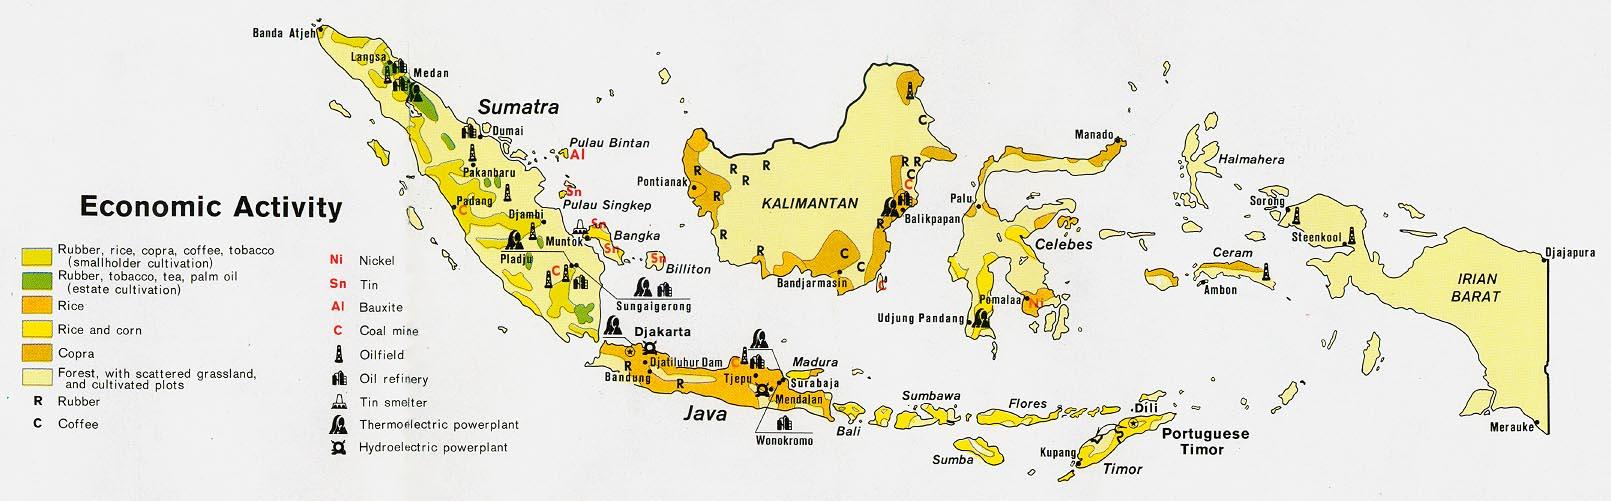 indonesia maps perrycasta241eda map collection ut